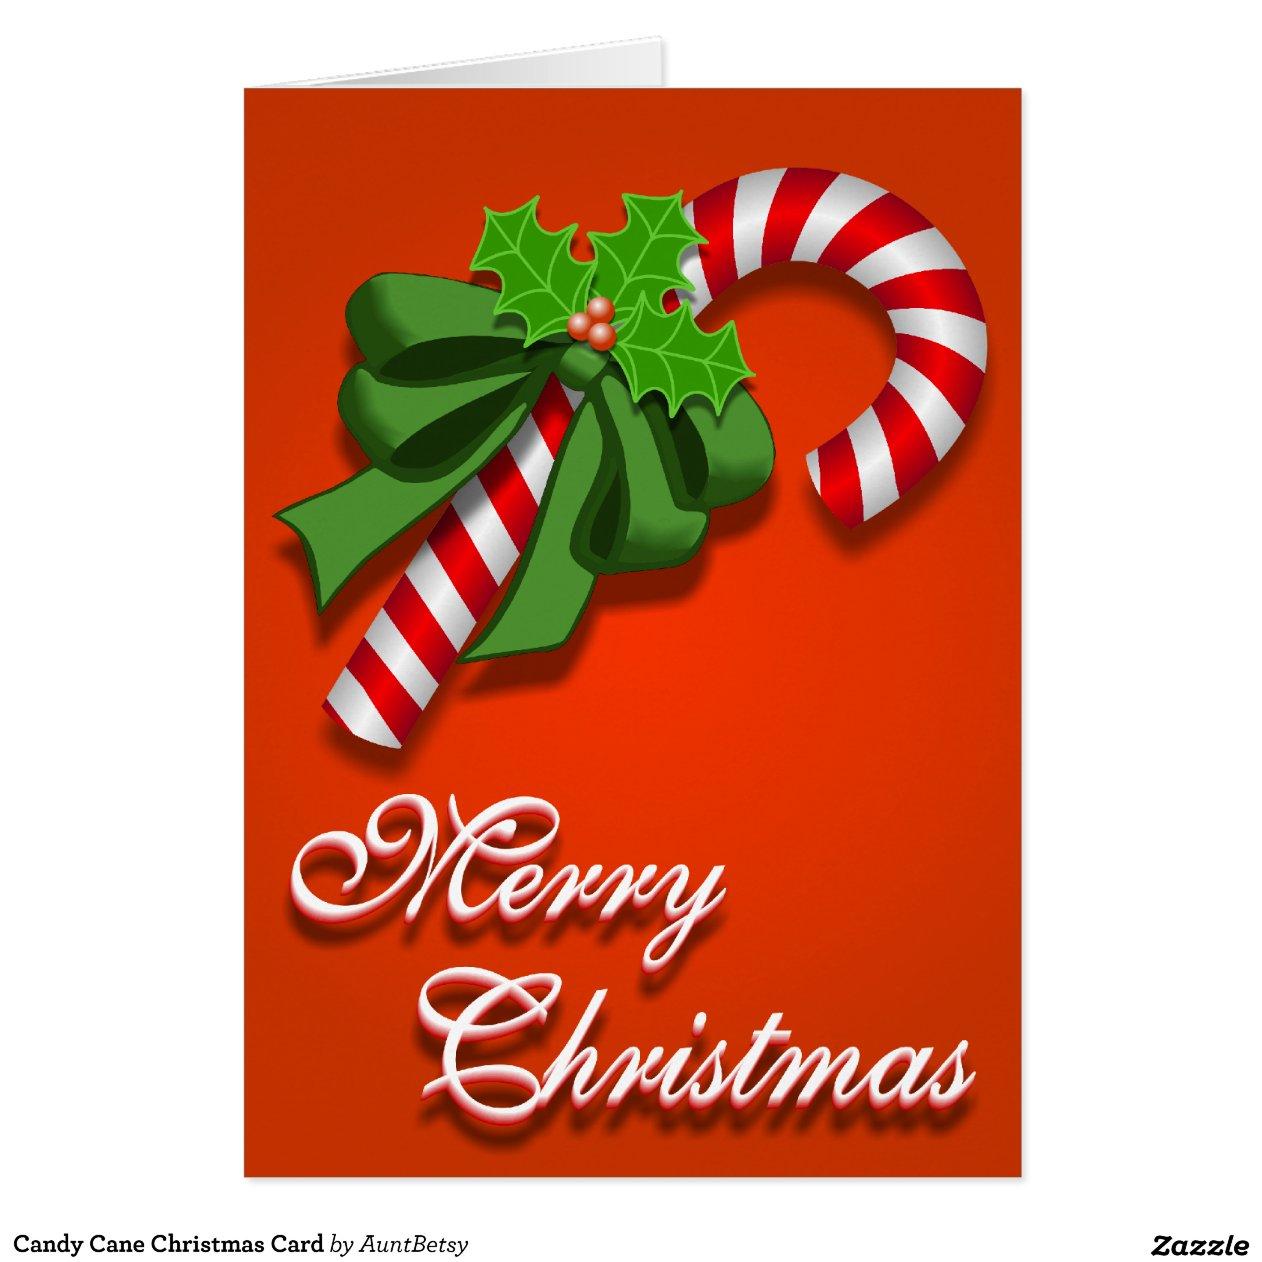 Candy Cane Christmas Card Zazzle